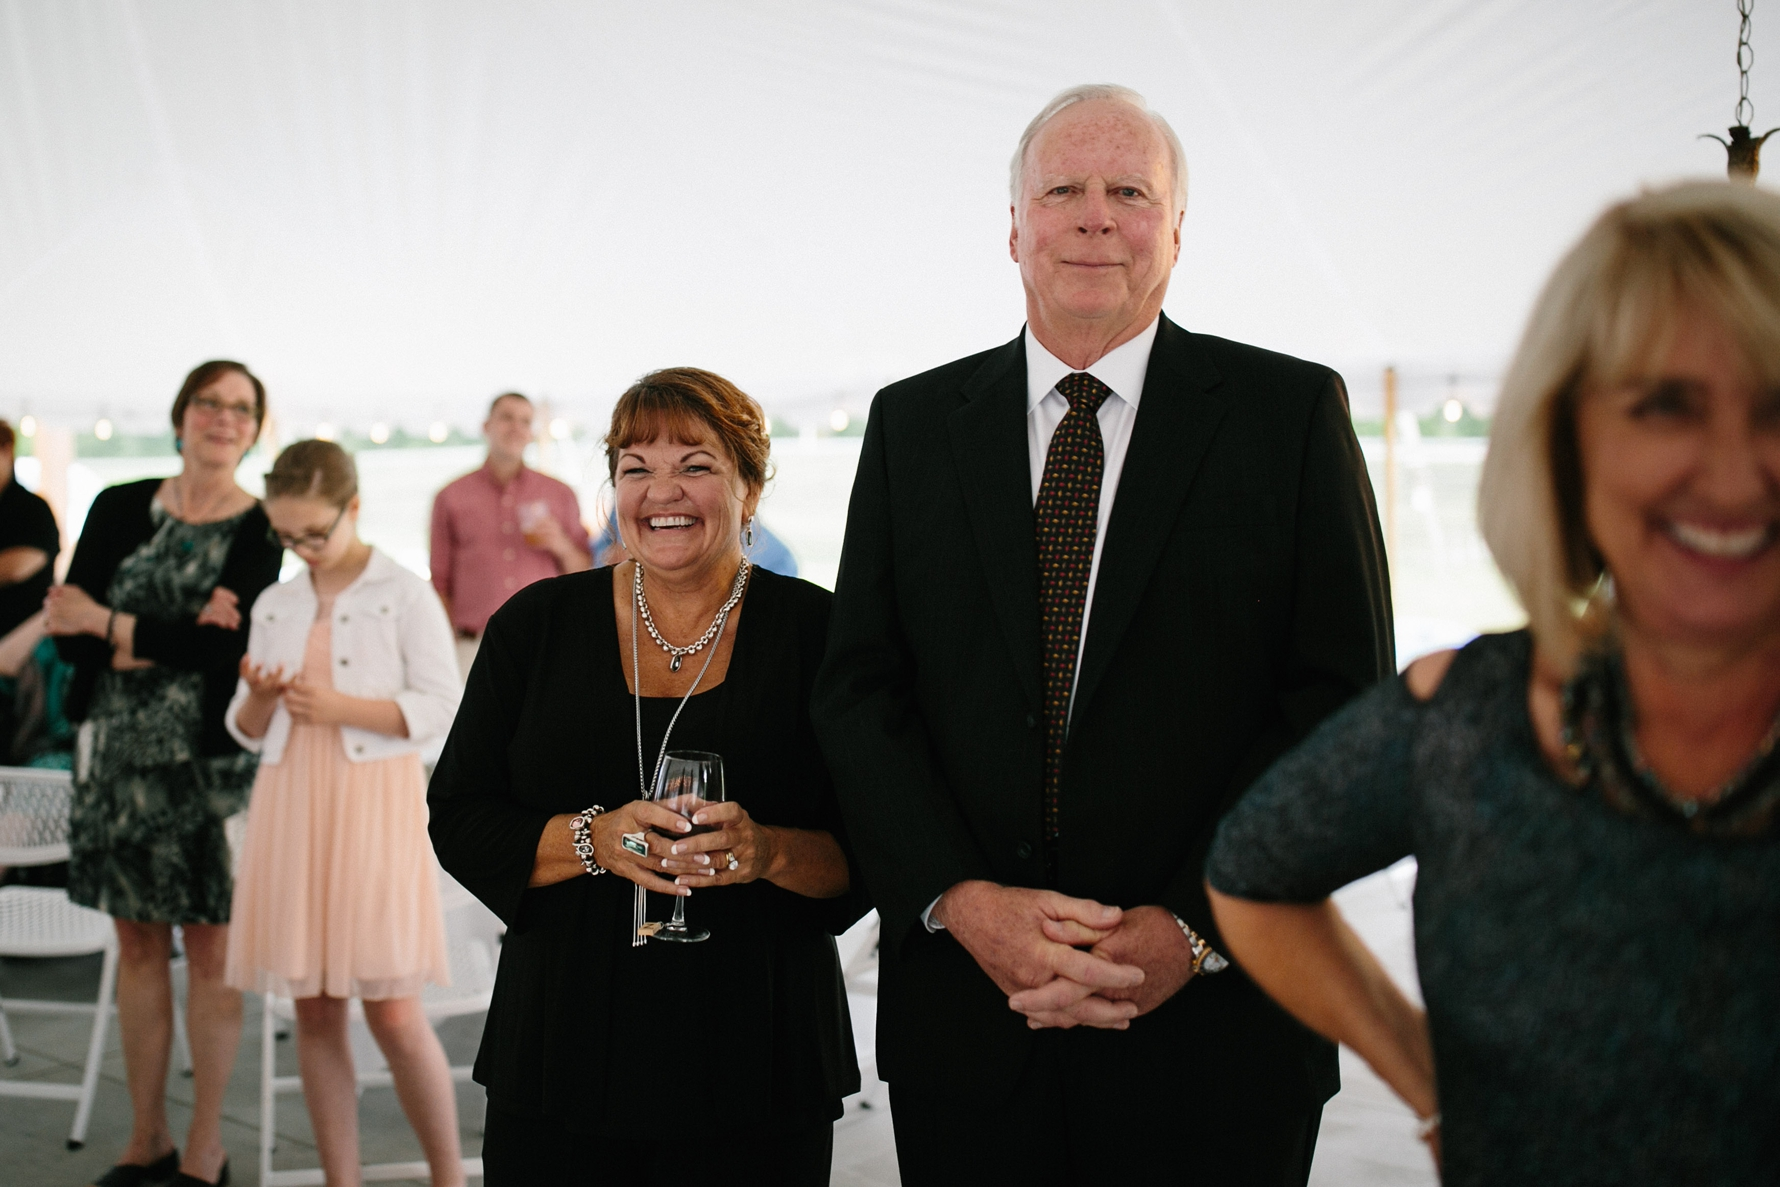 Anderson Wedding 098.JPG